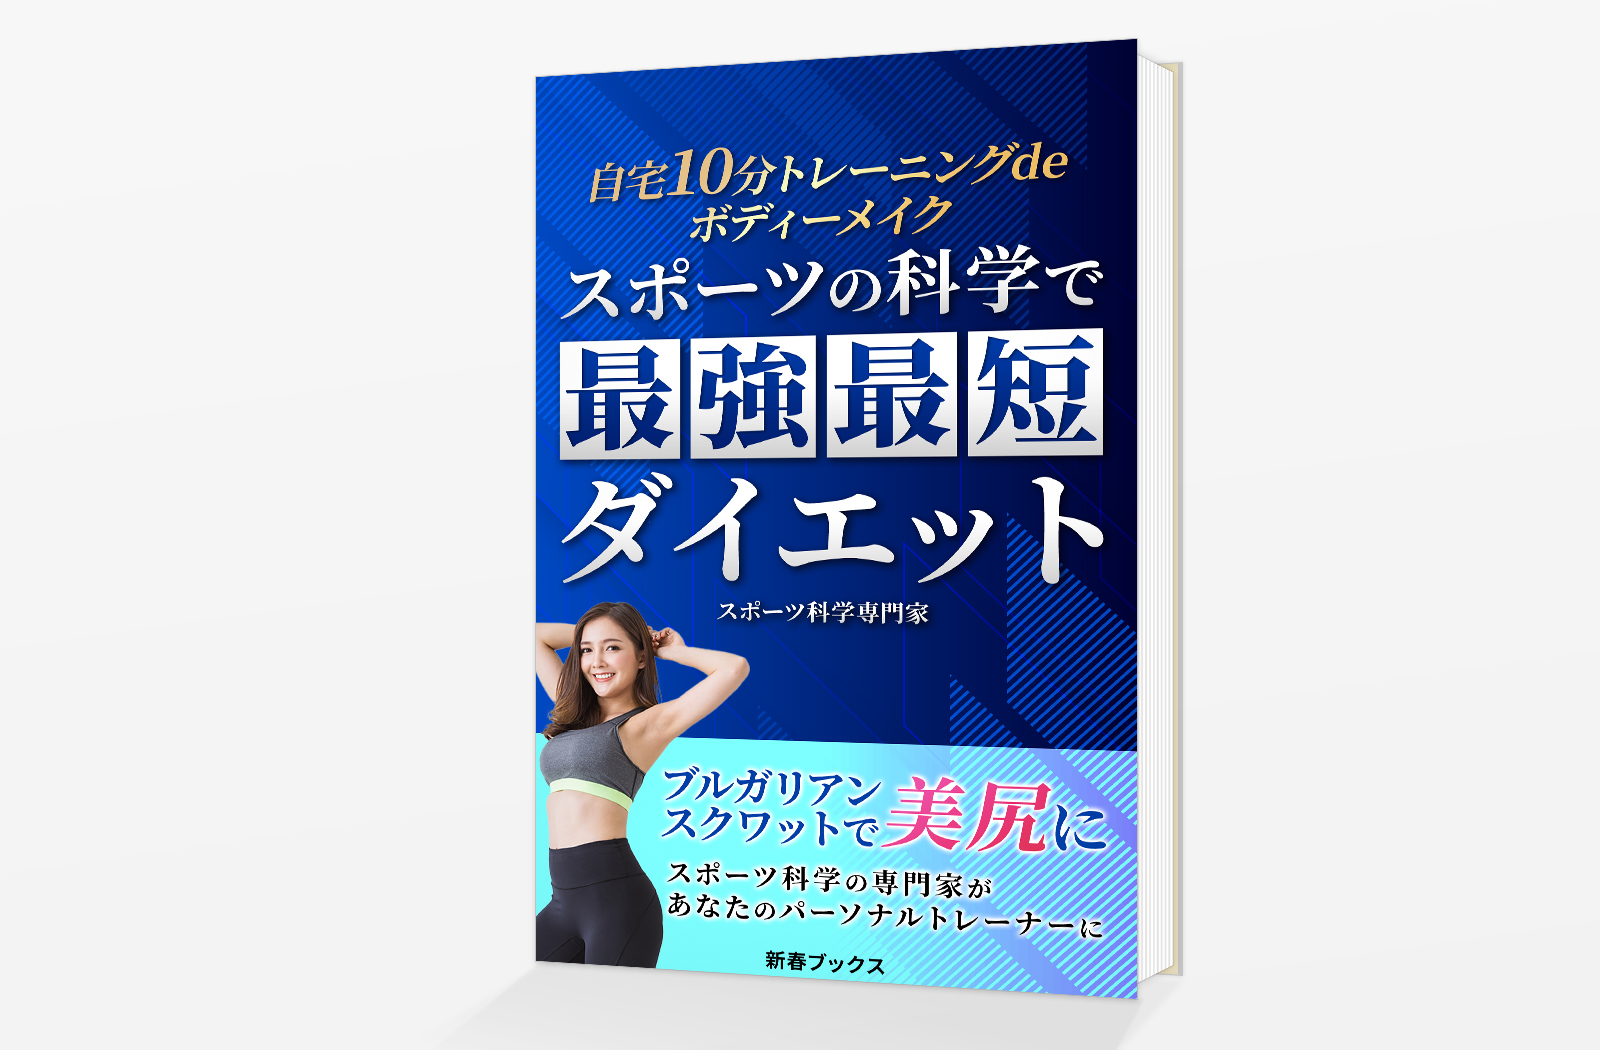 Kindle電子書籍「スポーツの科学で最強最短ダイエット: 自宅10分 トレーニングdeボディメイク」の表紙デザイン